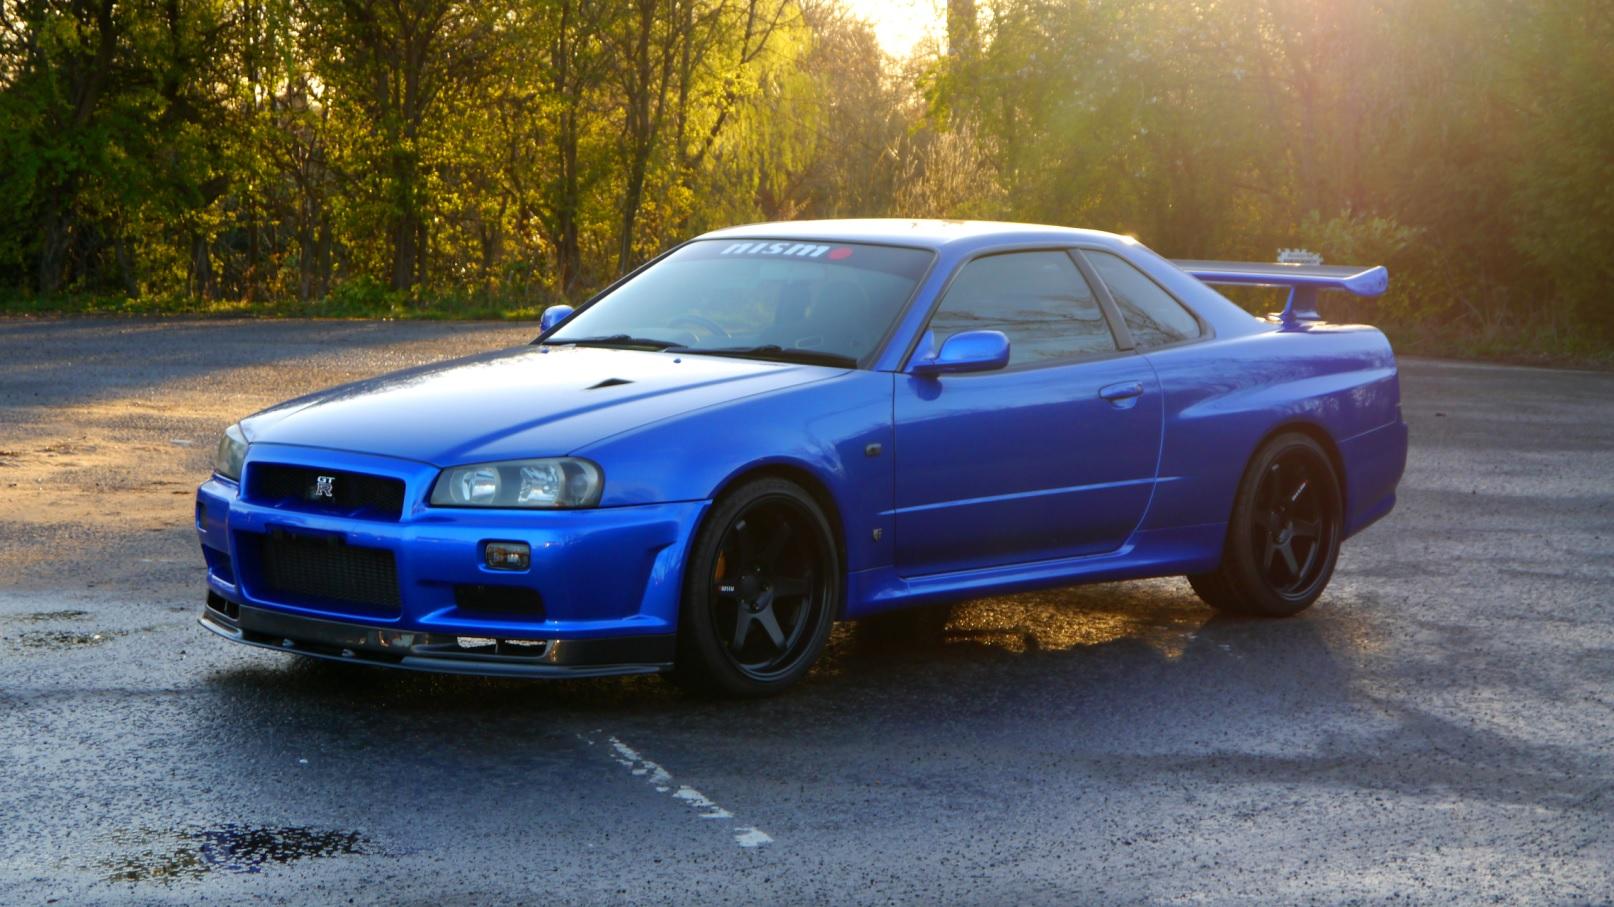 R34 Gtr For Sale >> 1999 Nissan Skyline Gtr R34 For Sale 2020 New Car Models